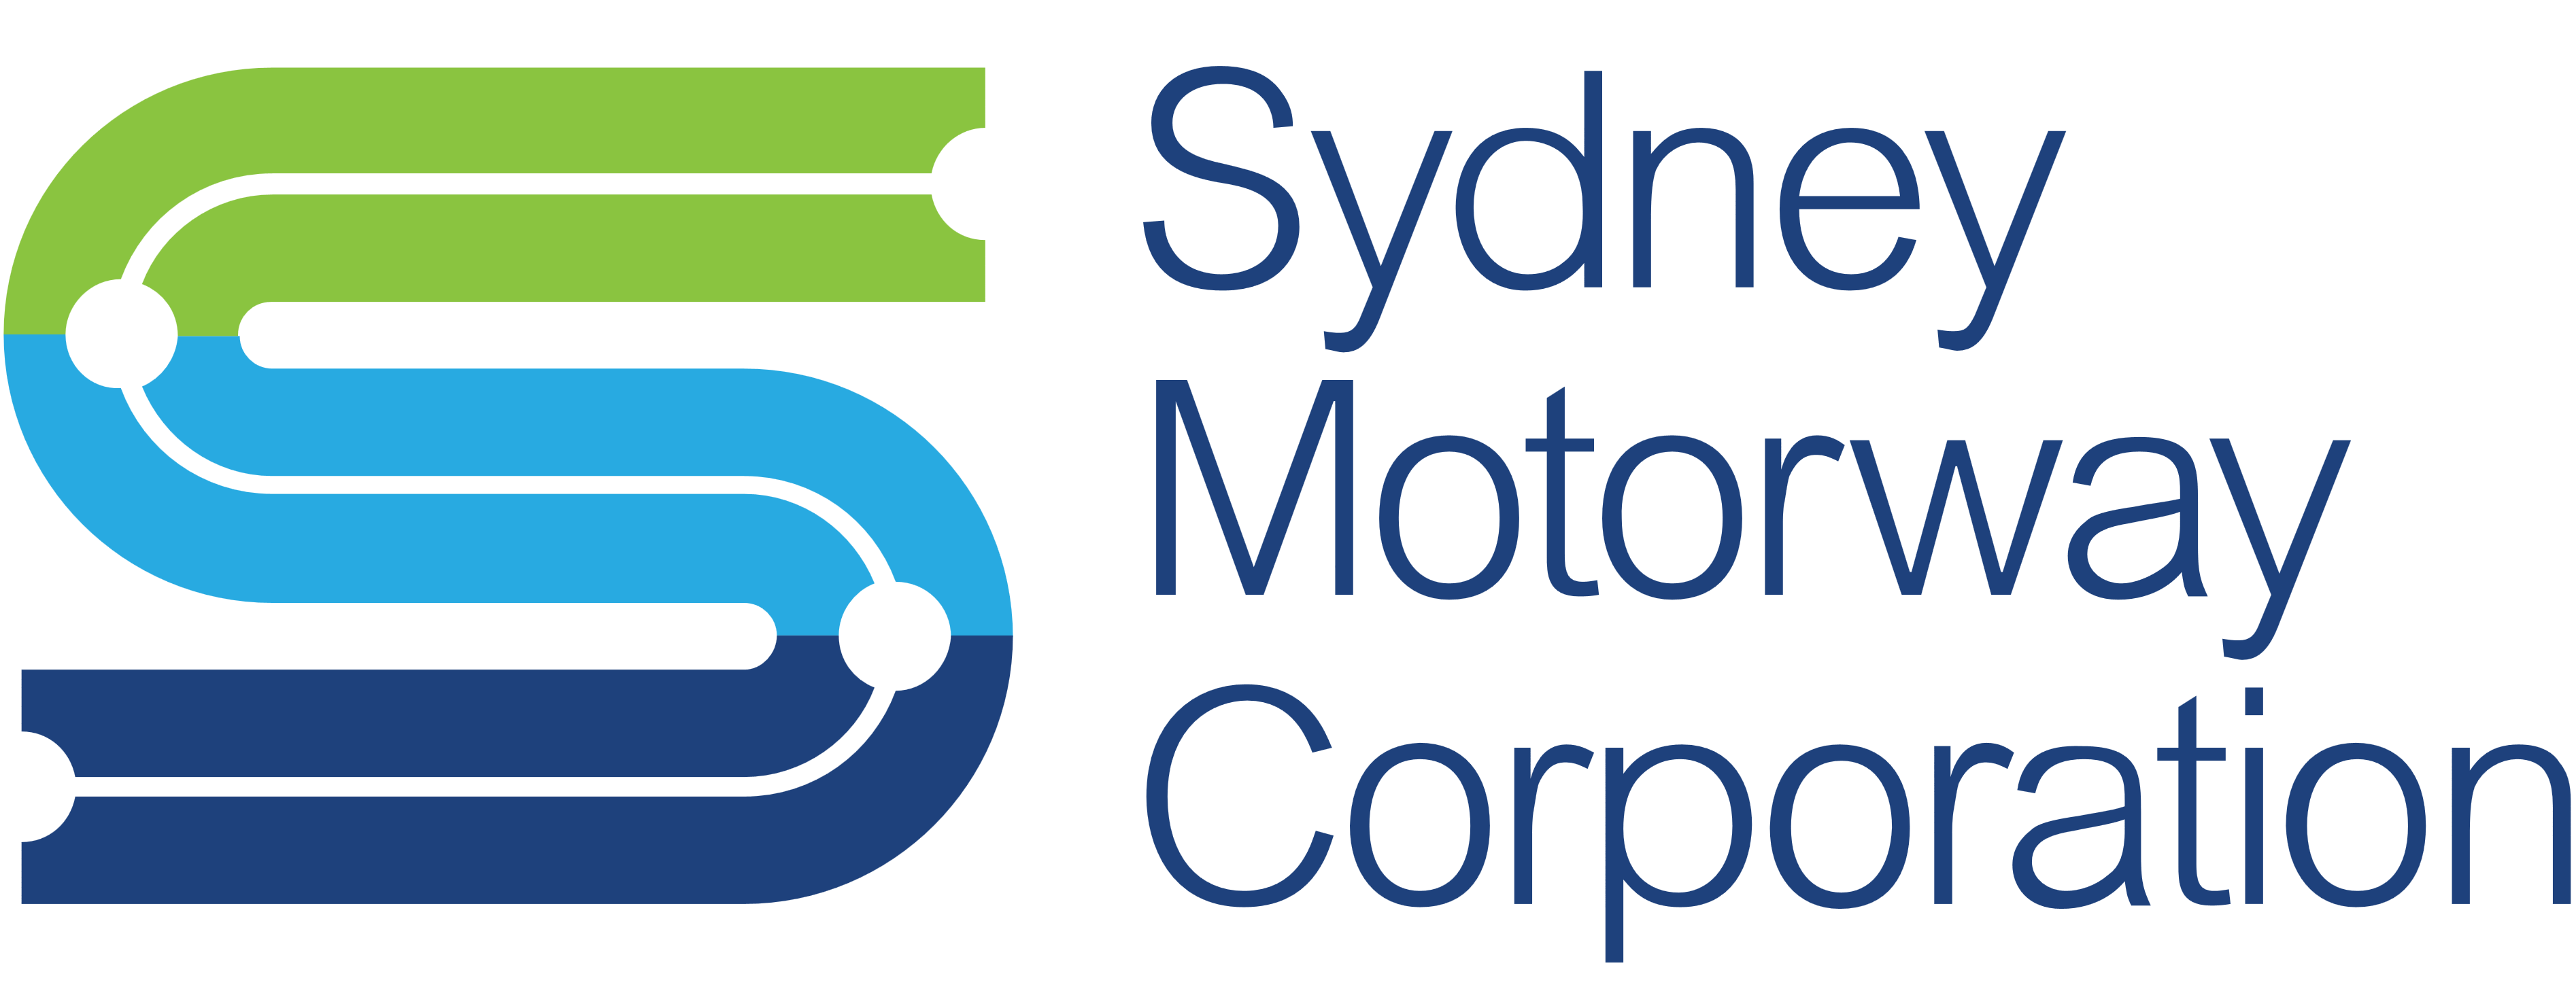 sydney motorway corporation logos download Vermont USDA Organic Logo Vector USDA Organic Logo Vector W Band